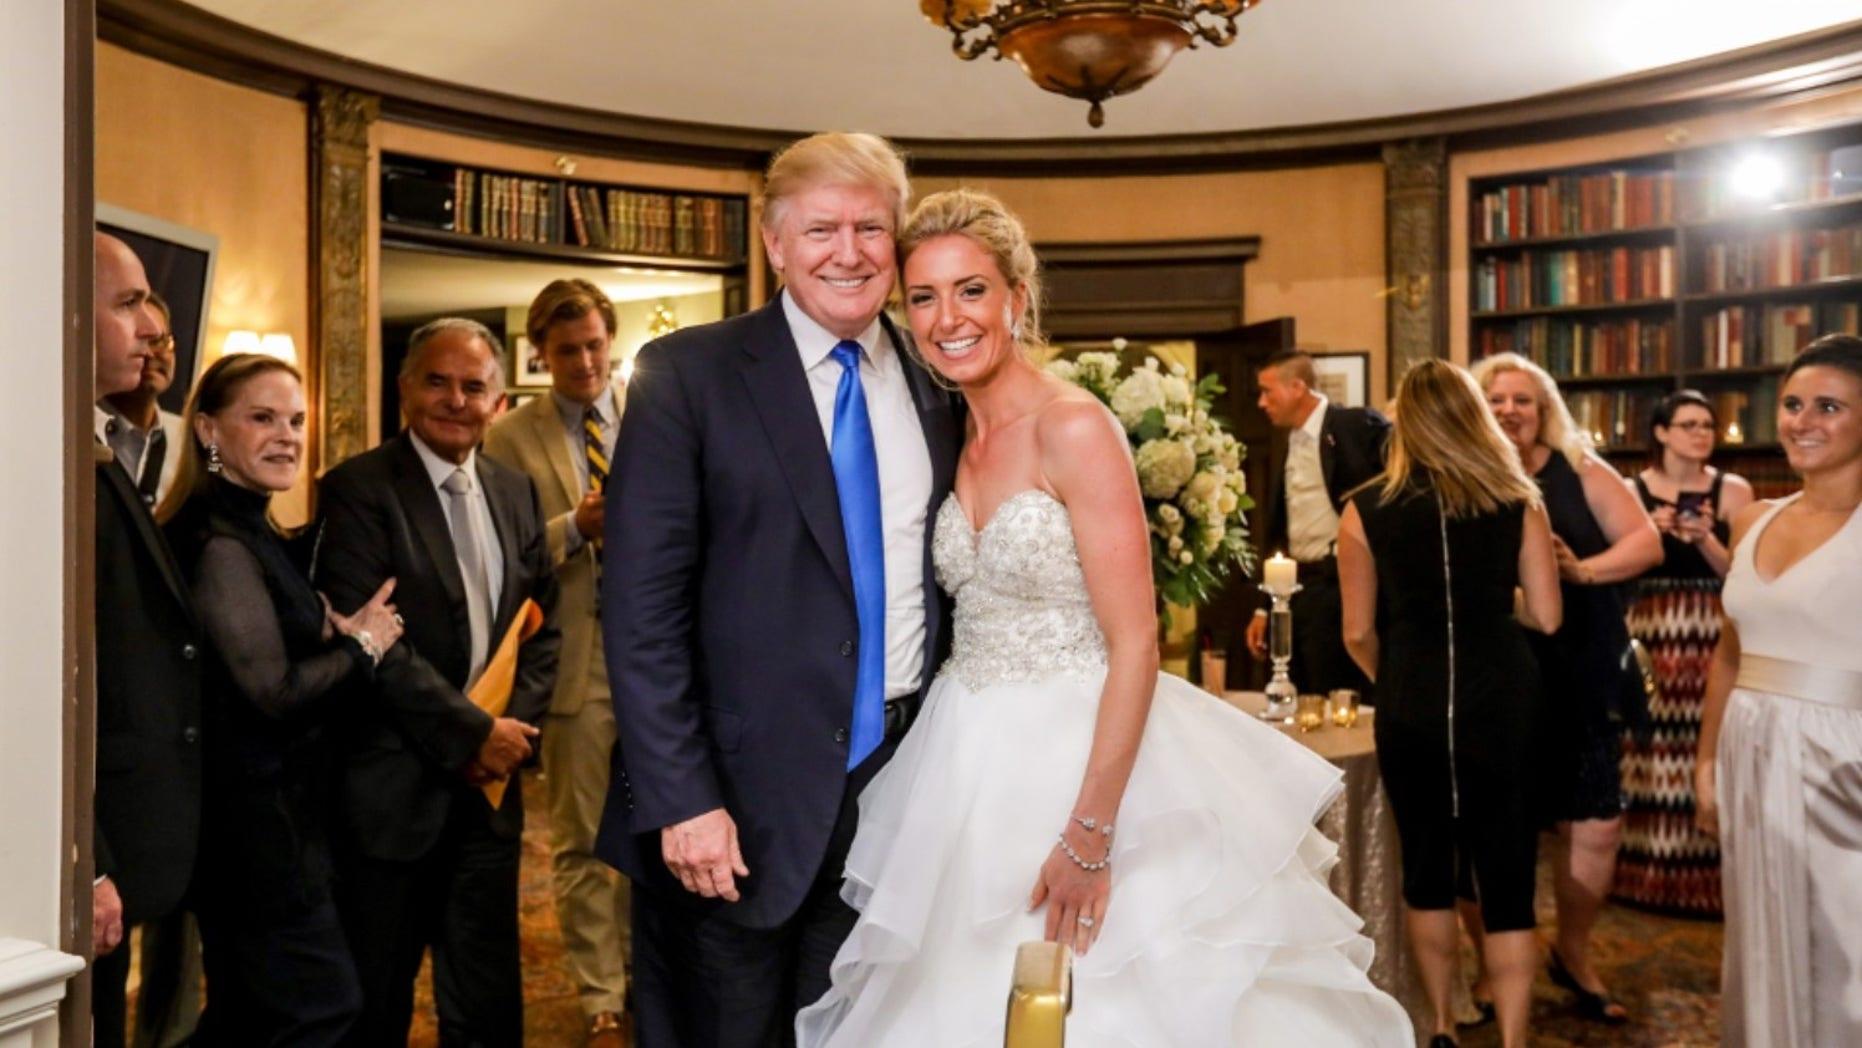 Trump Crashes Wedding.President Trump Crashes Wedding At His New Jersey Golf Club Fox News